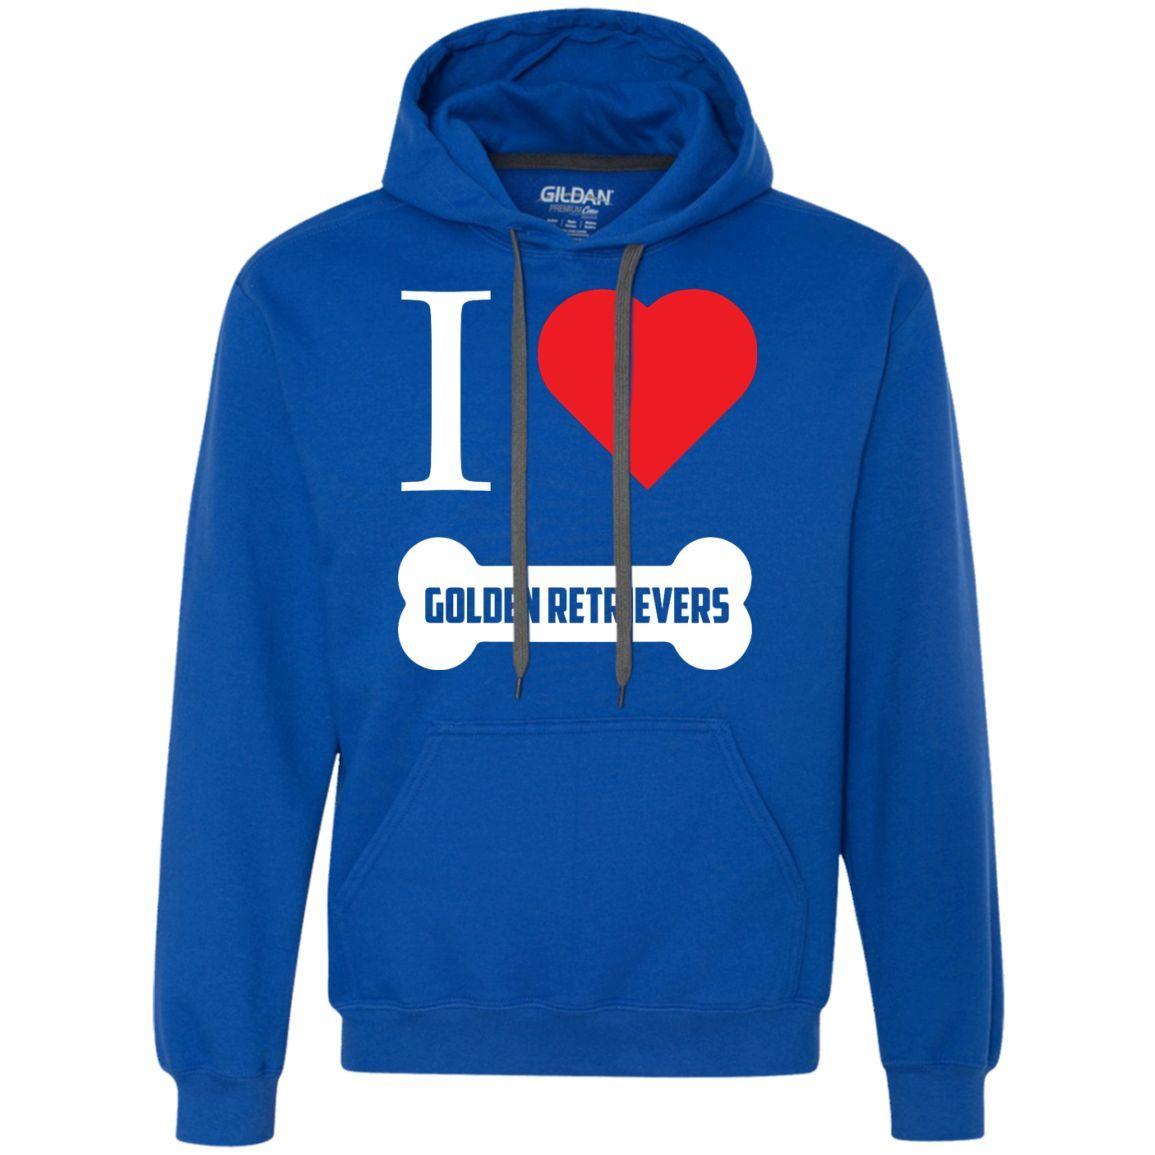 Golden Retriever- I LOVE MY GOLDEN RETRIEVER (BONE DESIGN) - Heavyweight Pullover Fleece Sweatshirt